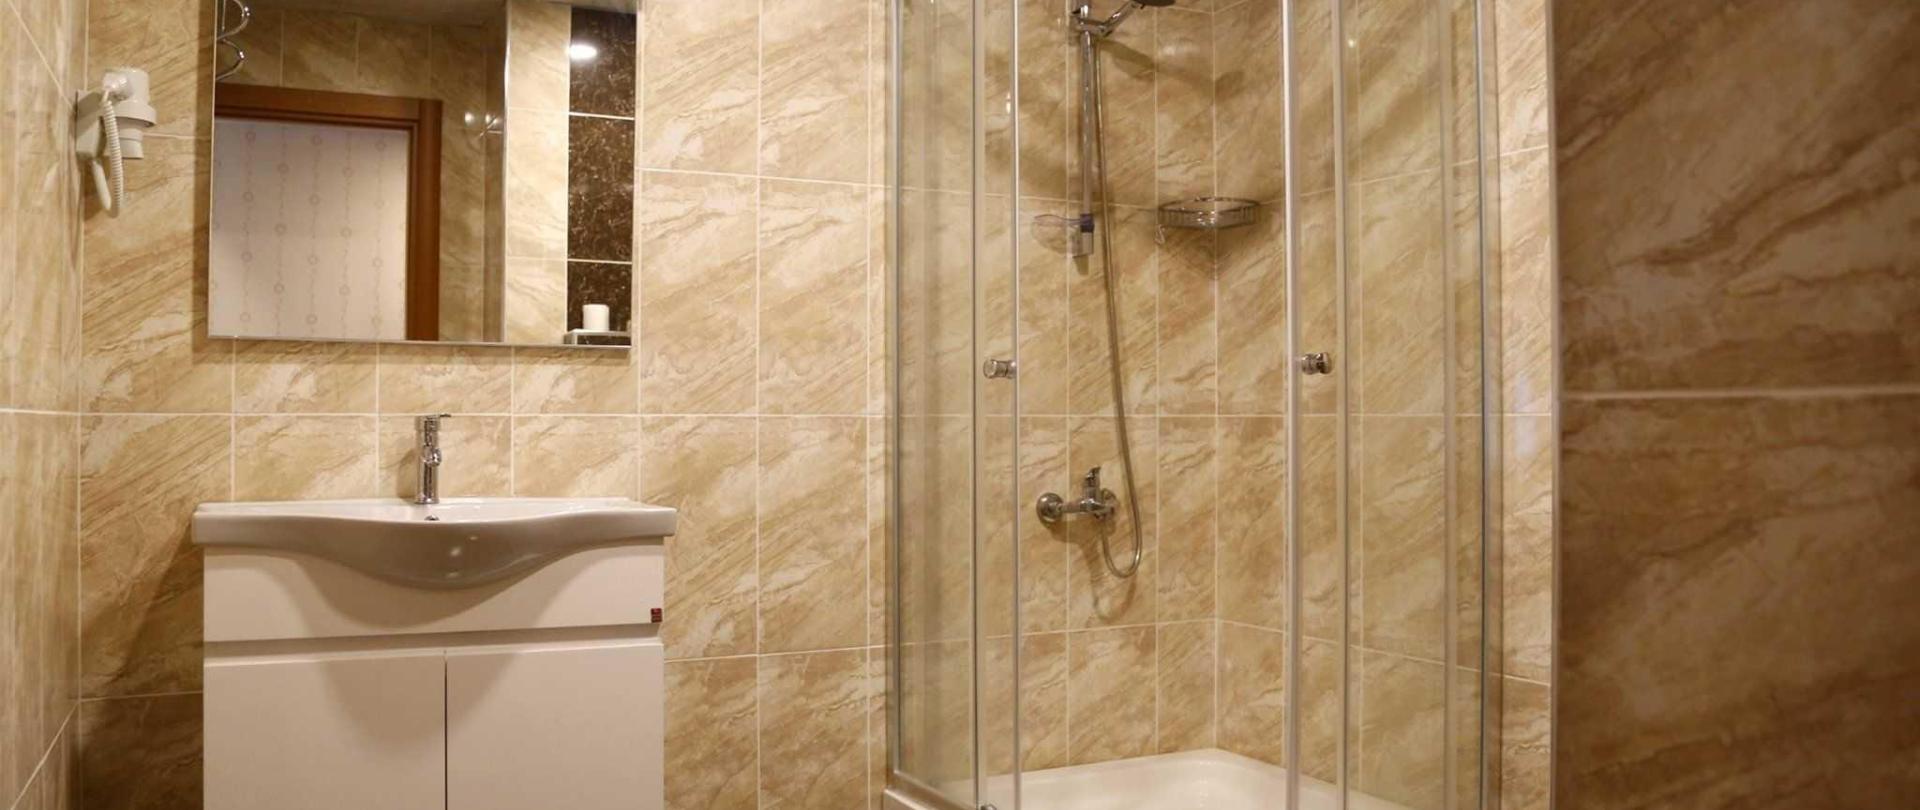 banyolar-2-5116-x-3456.jpg